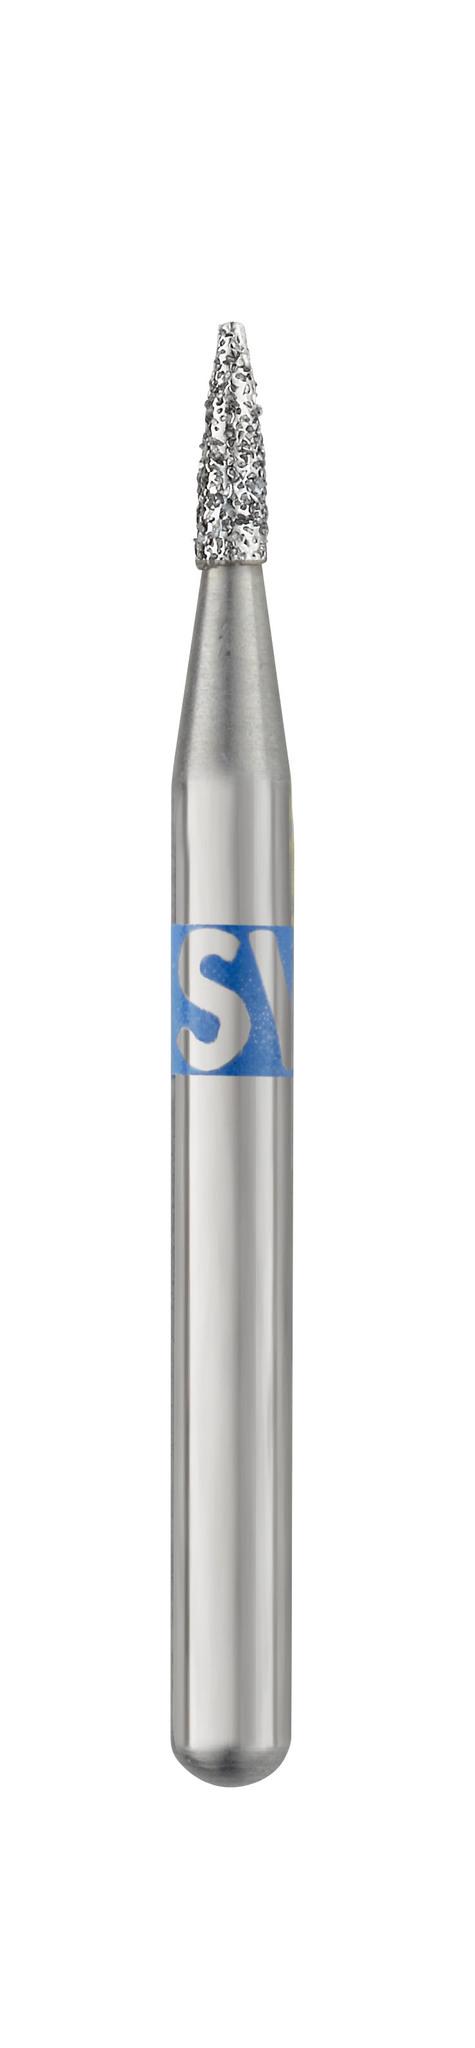 Алмазные боры «SS WHITE» серия HP 860/010